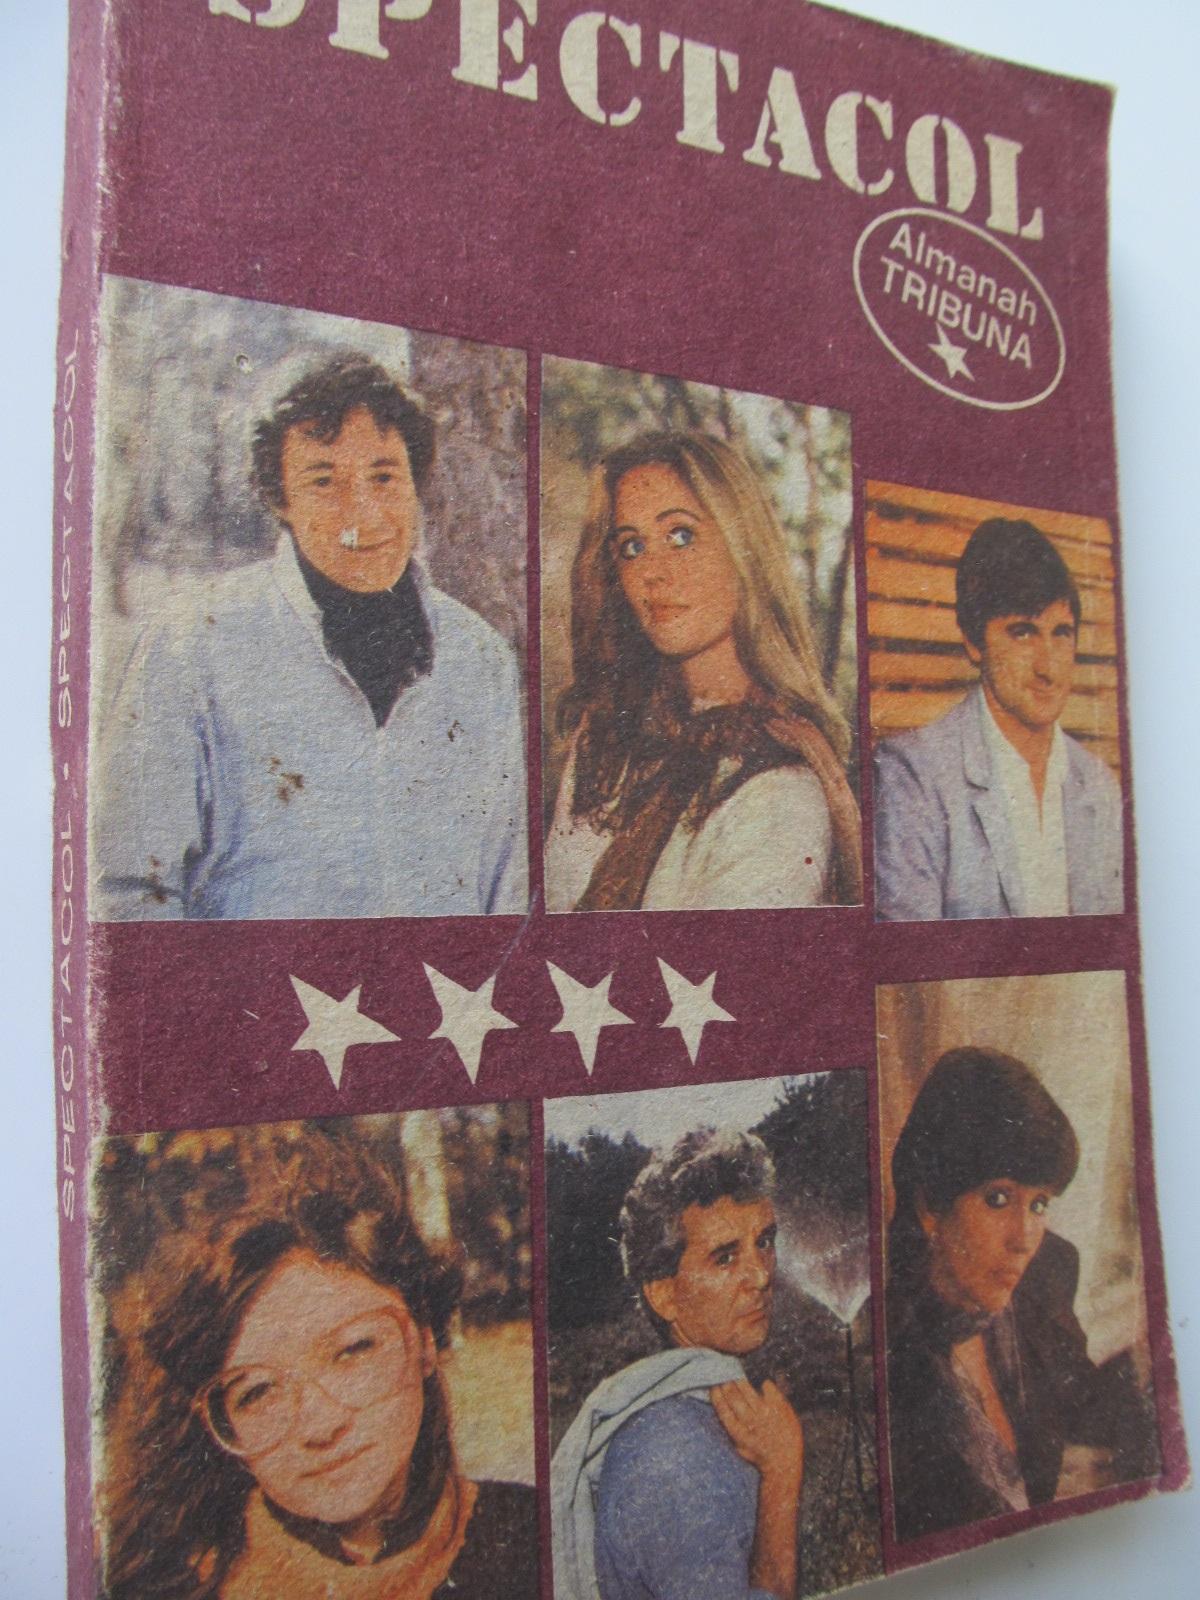 Spectacol - Almanah Tribuna 1988 - *** | Detalii carte